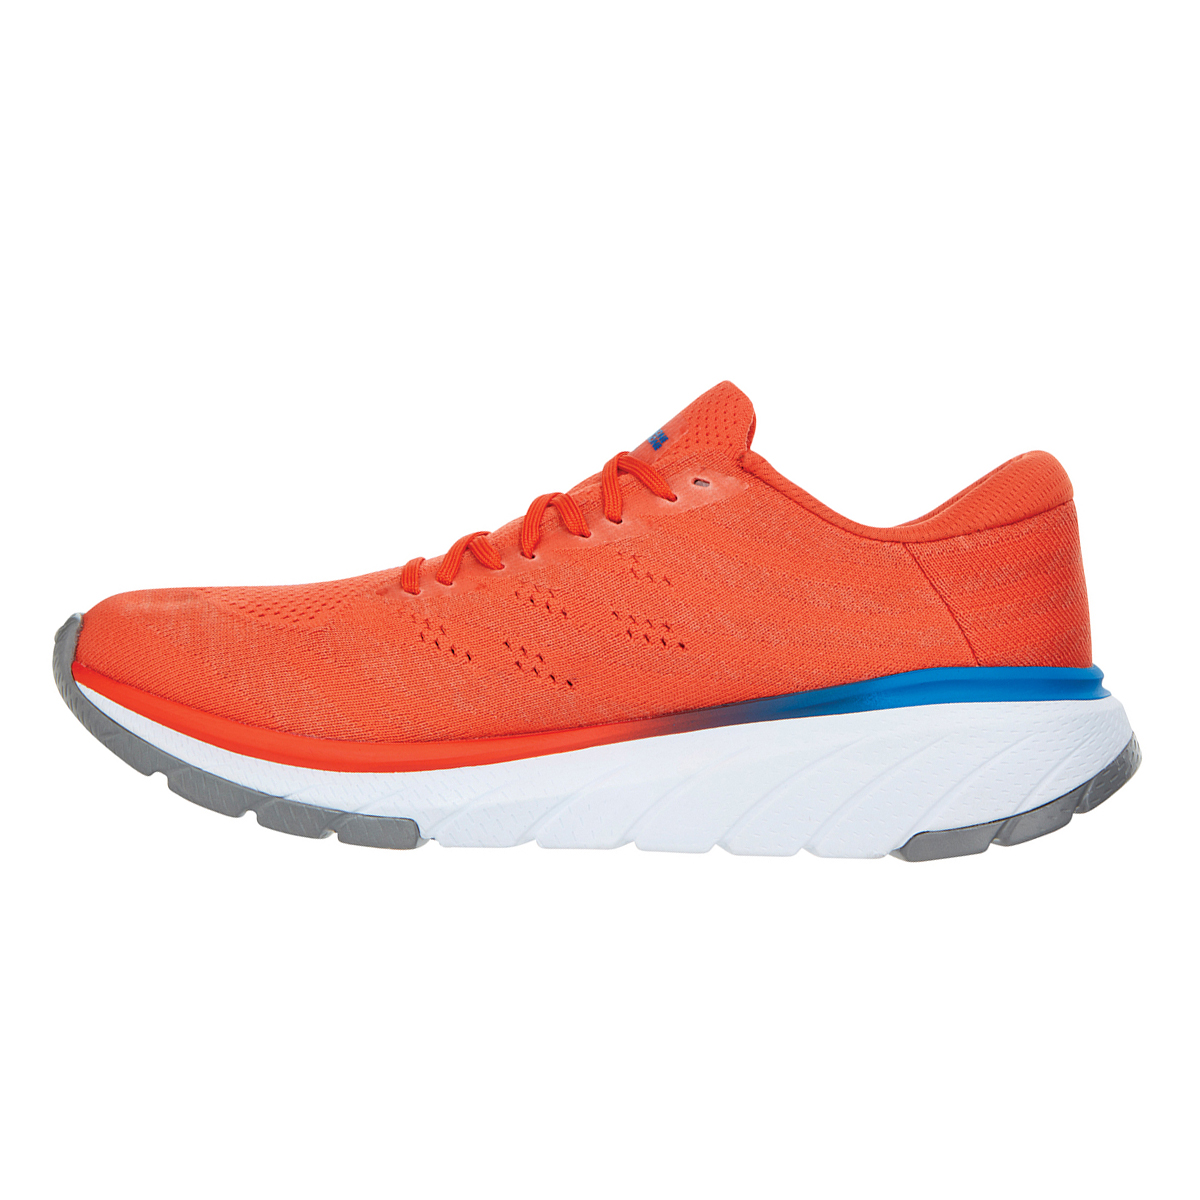 Men's Hoka One One Cavu 3 Running Shoe - Color: Mandarin Red/White - Size: 7 - Width: Regular, Mandarin Red/White, large, image 2